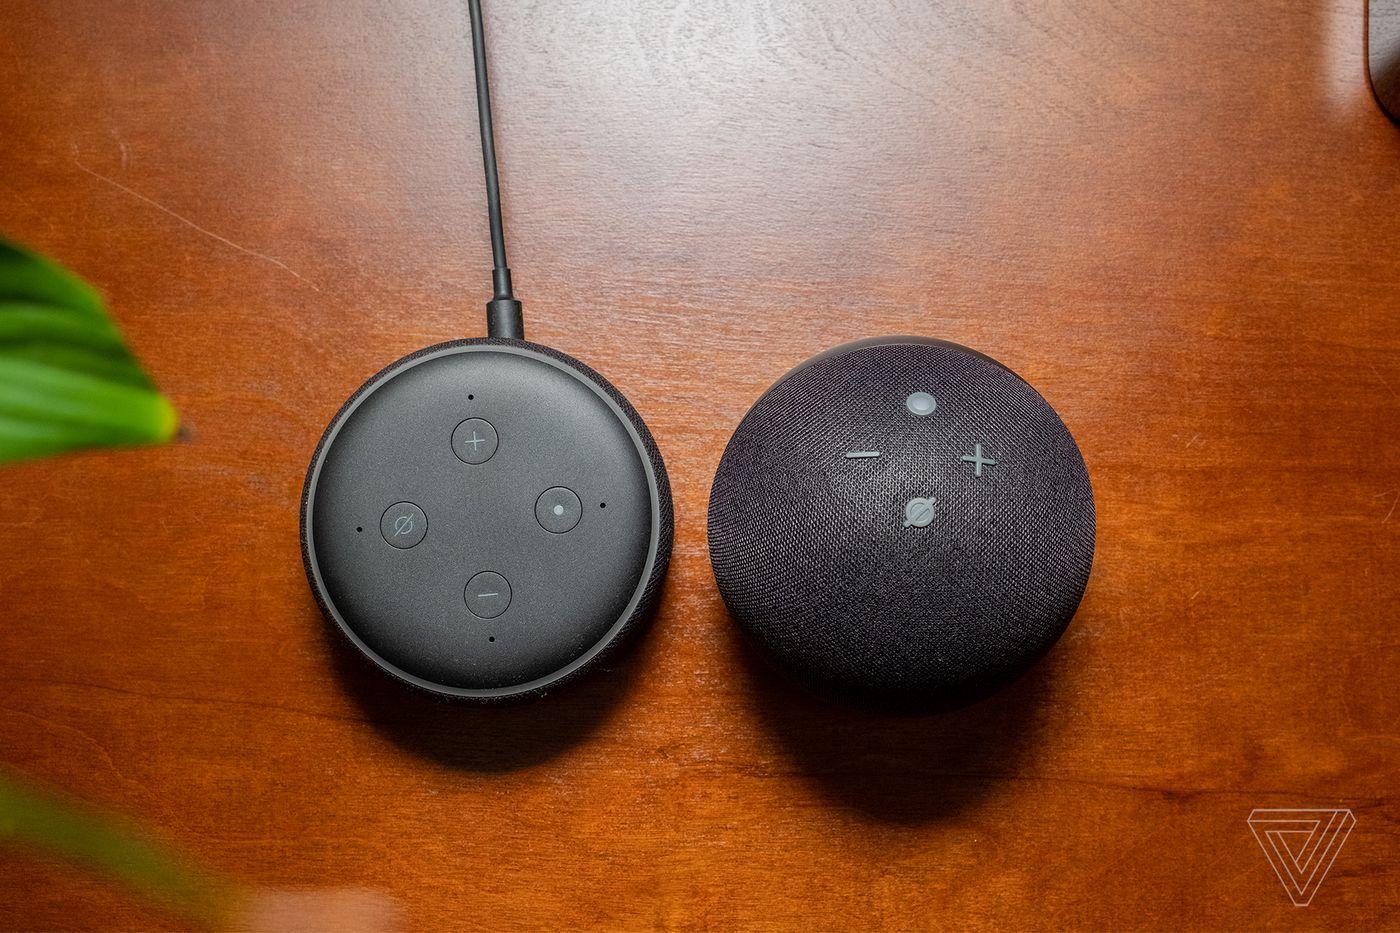 Amazon's new 'adaptive volume' will cause Alexa to talk stronger when it's loud